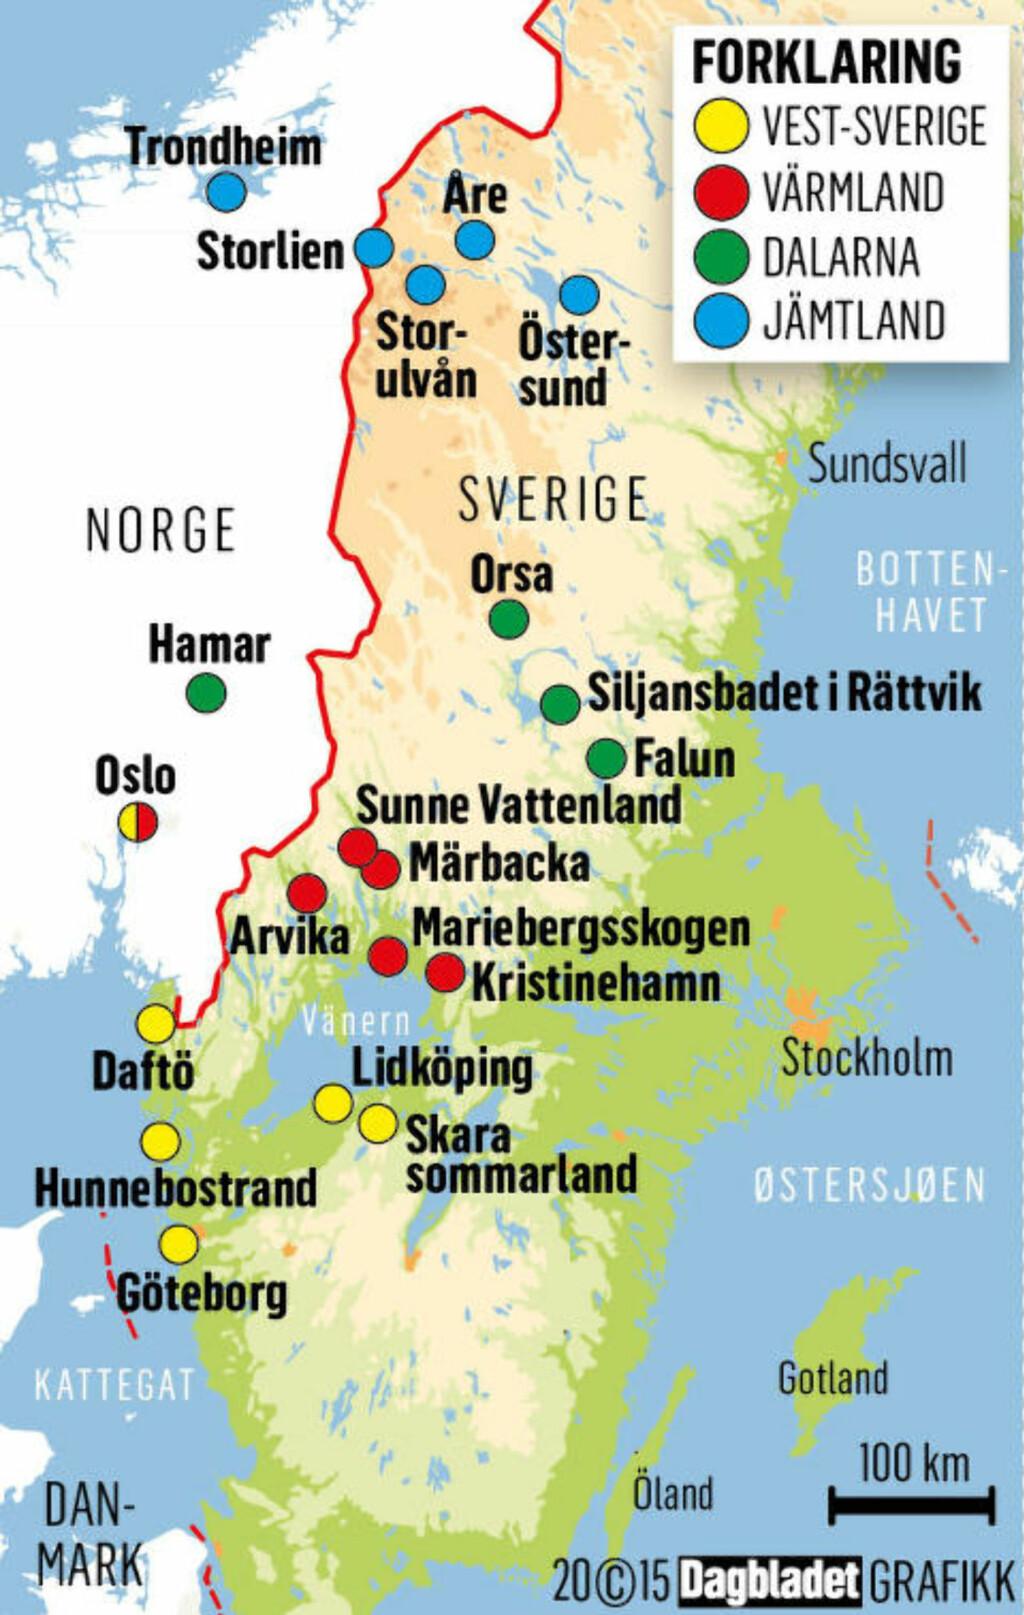 campingplasser sverige kart Se alt du kan gjøre sammen med familien i Sverige   Dagbladet campingplasser sverige kart